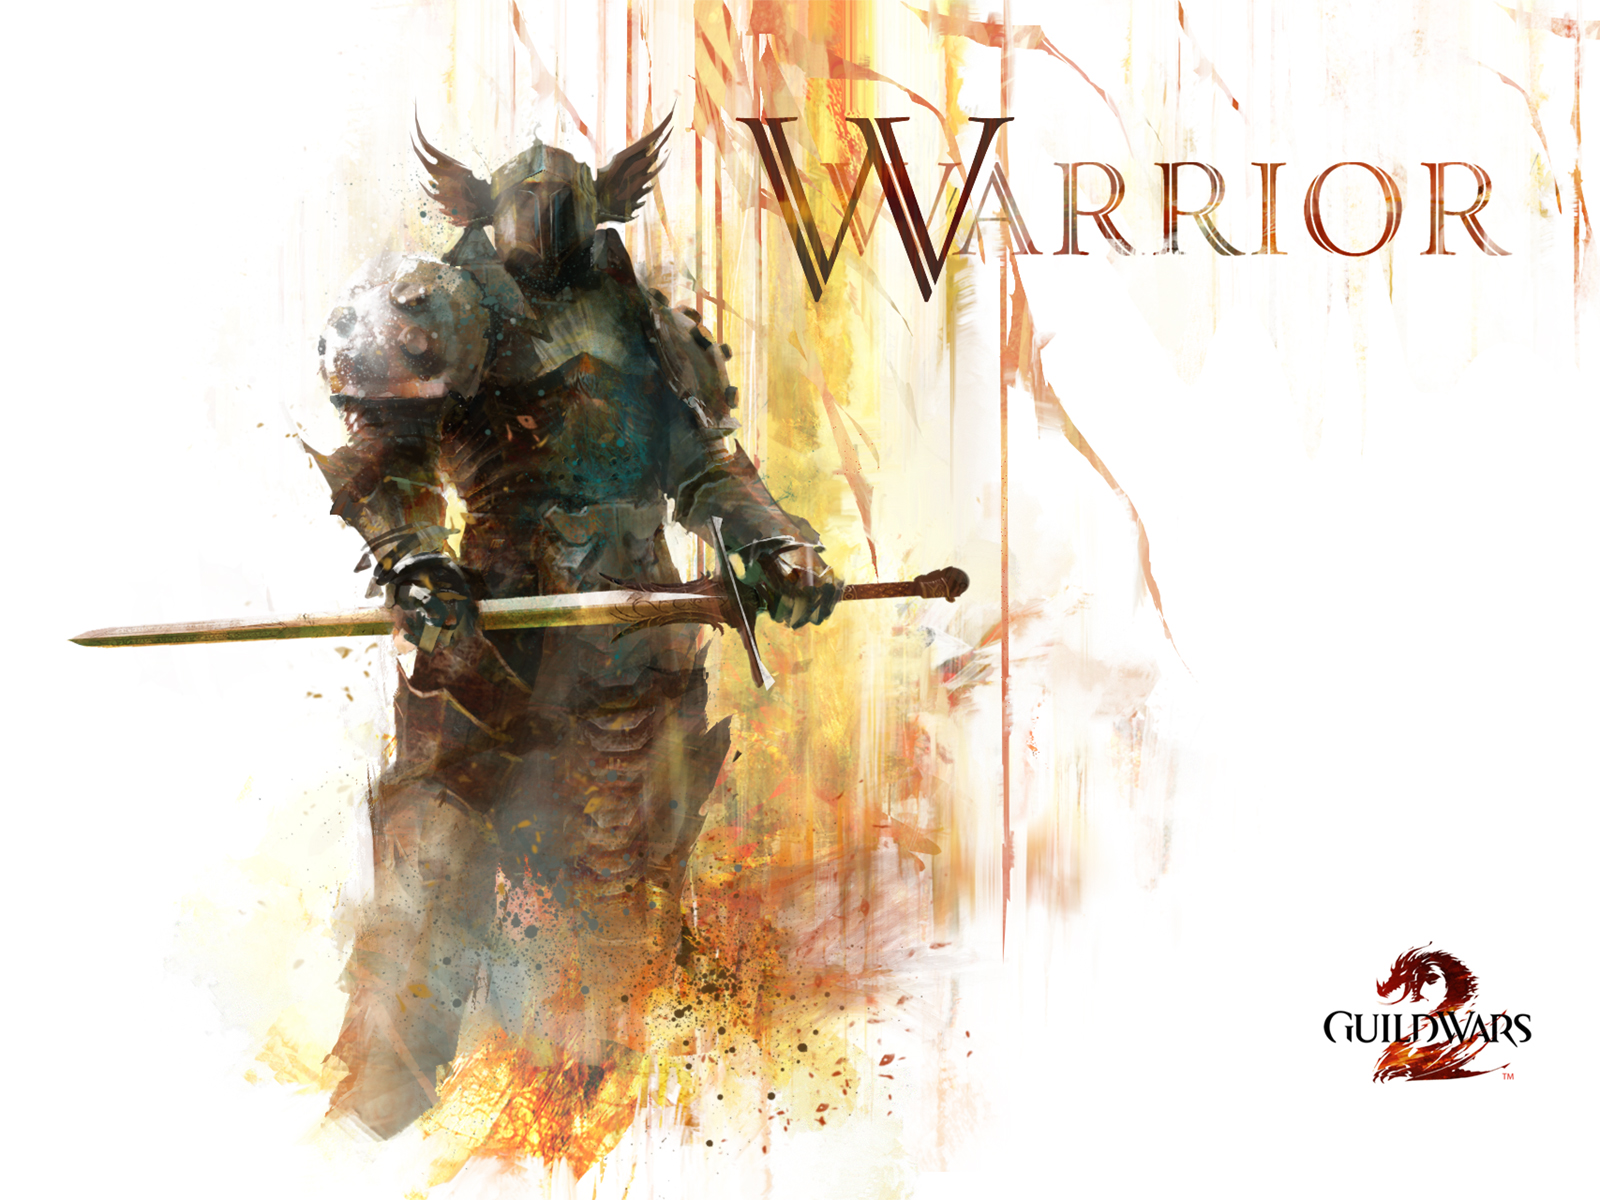 Guild wars 2 slot skills warrior